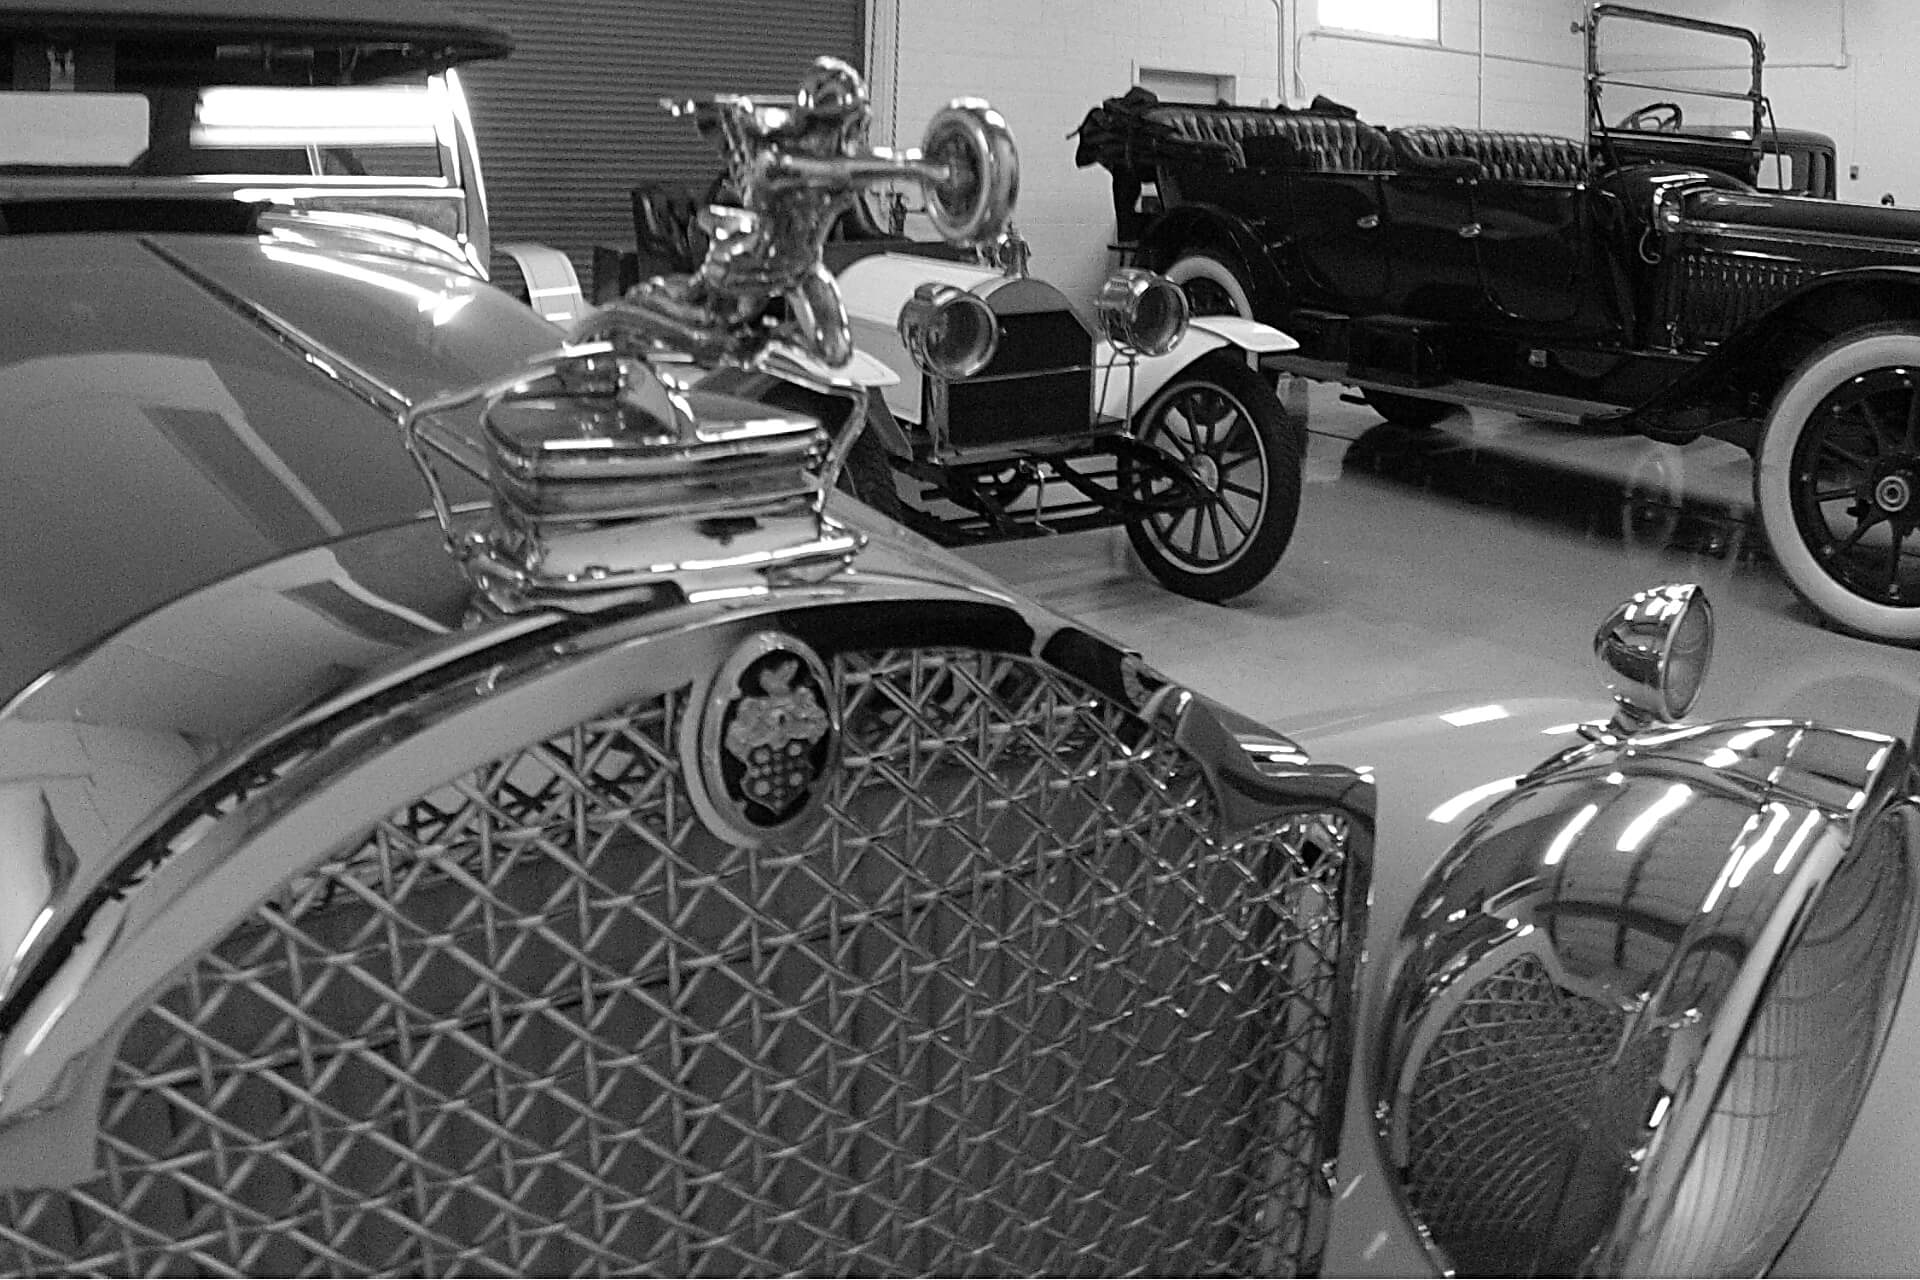 repair interior car restoration shutterstock auburn services auto washington valley repairservices maple